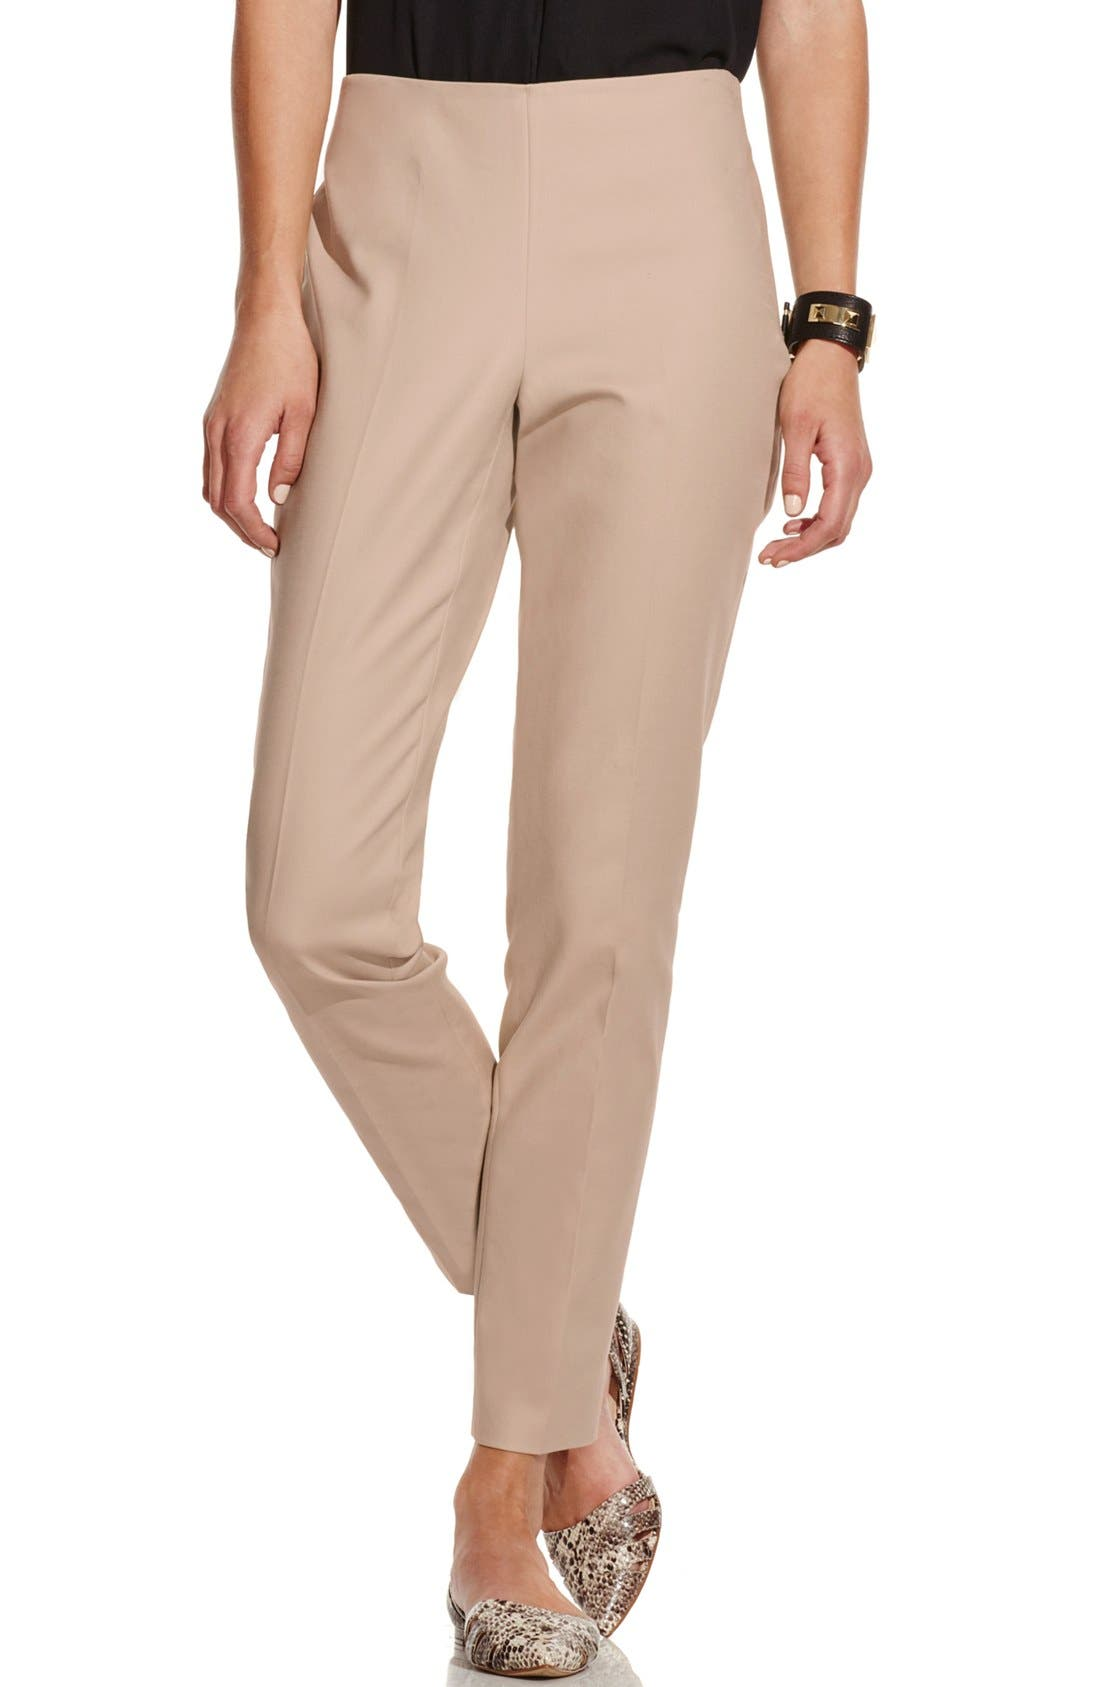 Vince Camuto Side Zip Double Weave Stretch Cotton Pants (Regular & Petite)